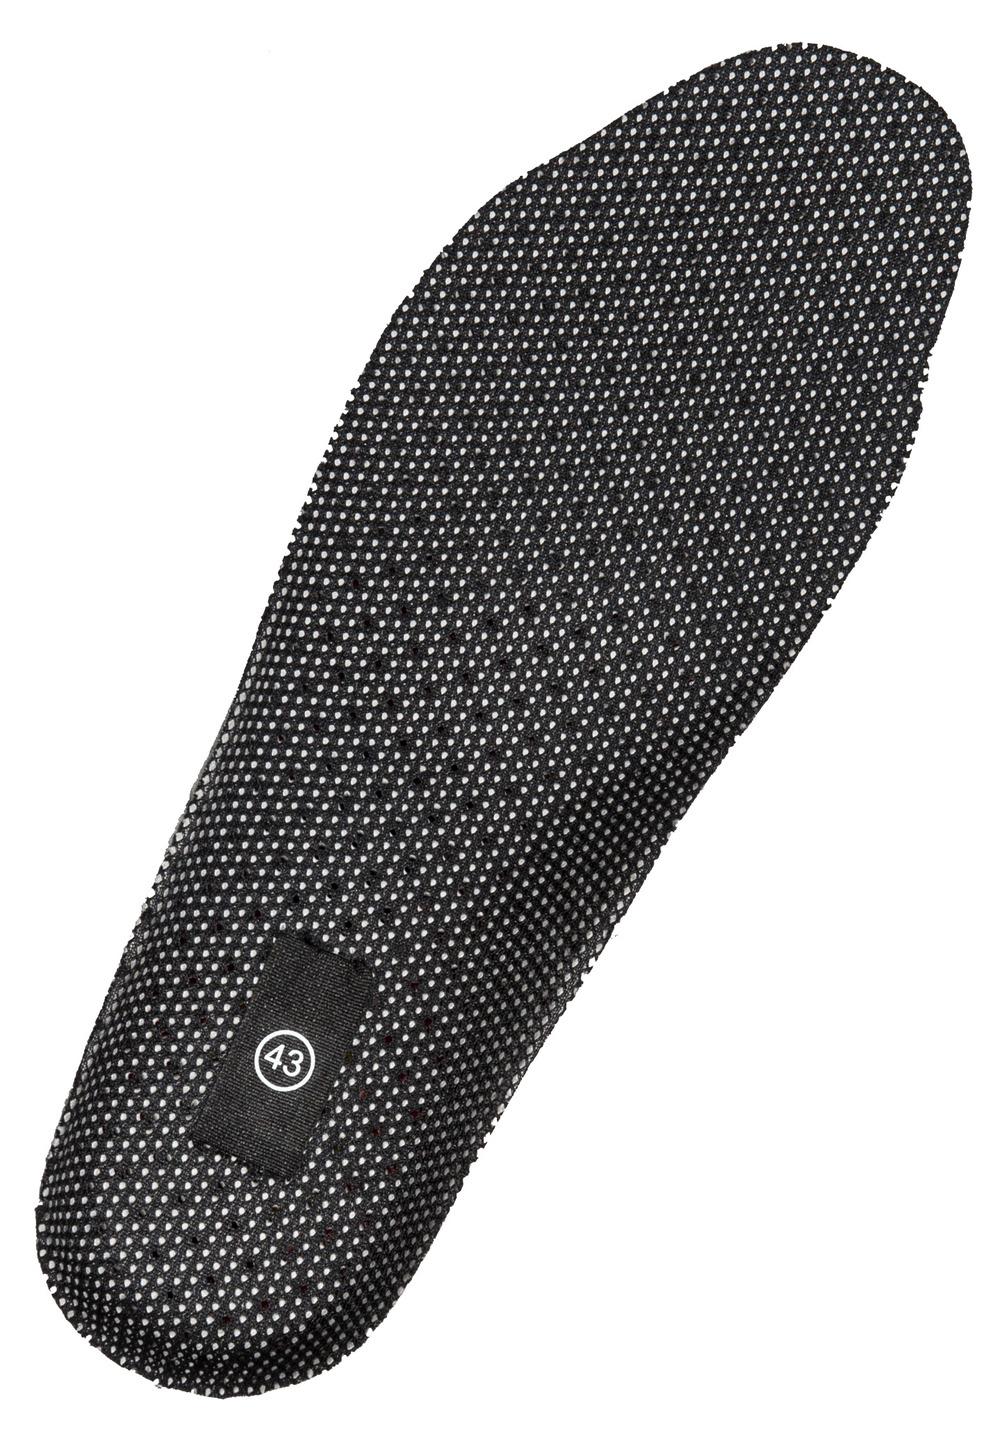 FT086-980-09 Plantillas - negro